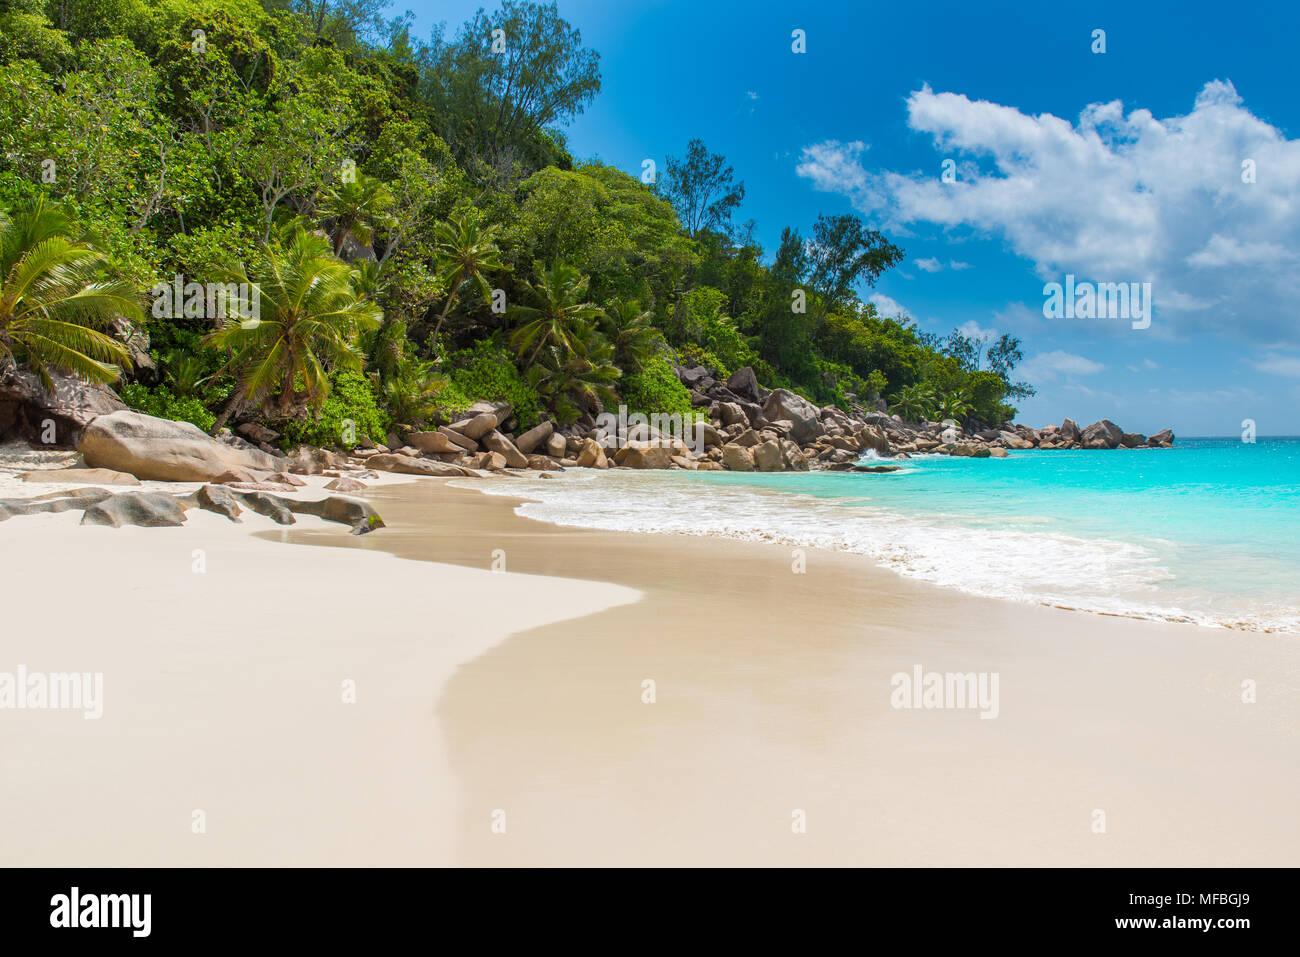 Beautiful Paradise beach - Anse Georgette at Praslin, Seychelles Stock Photo